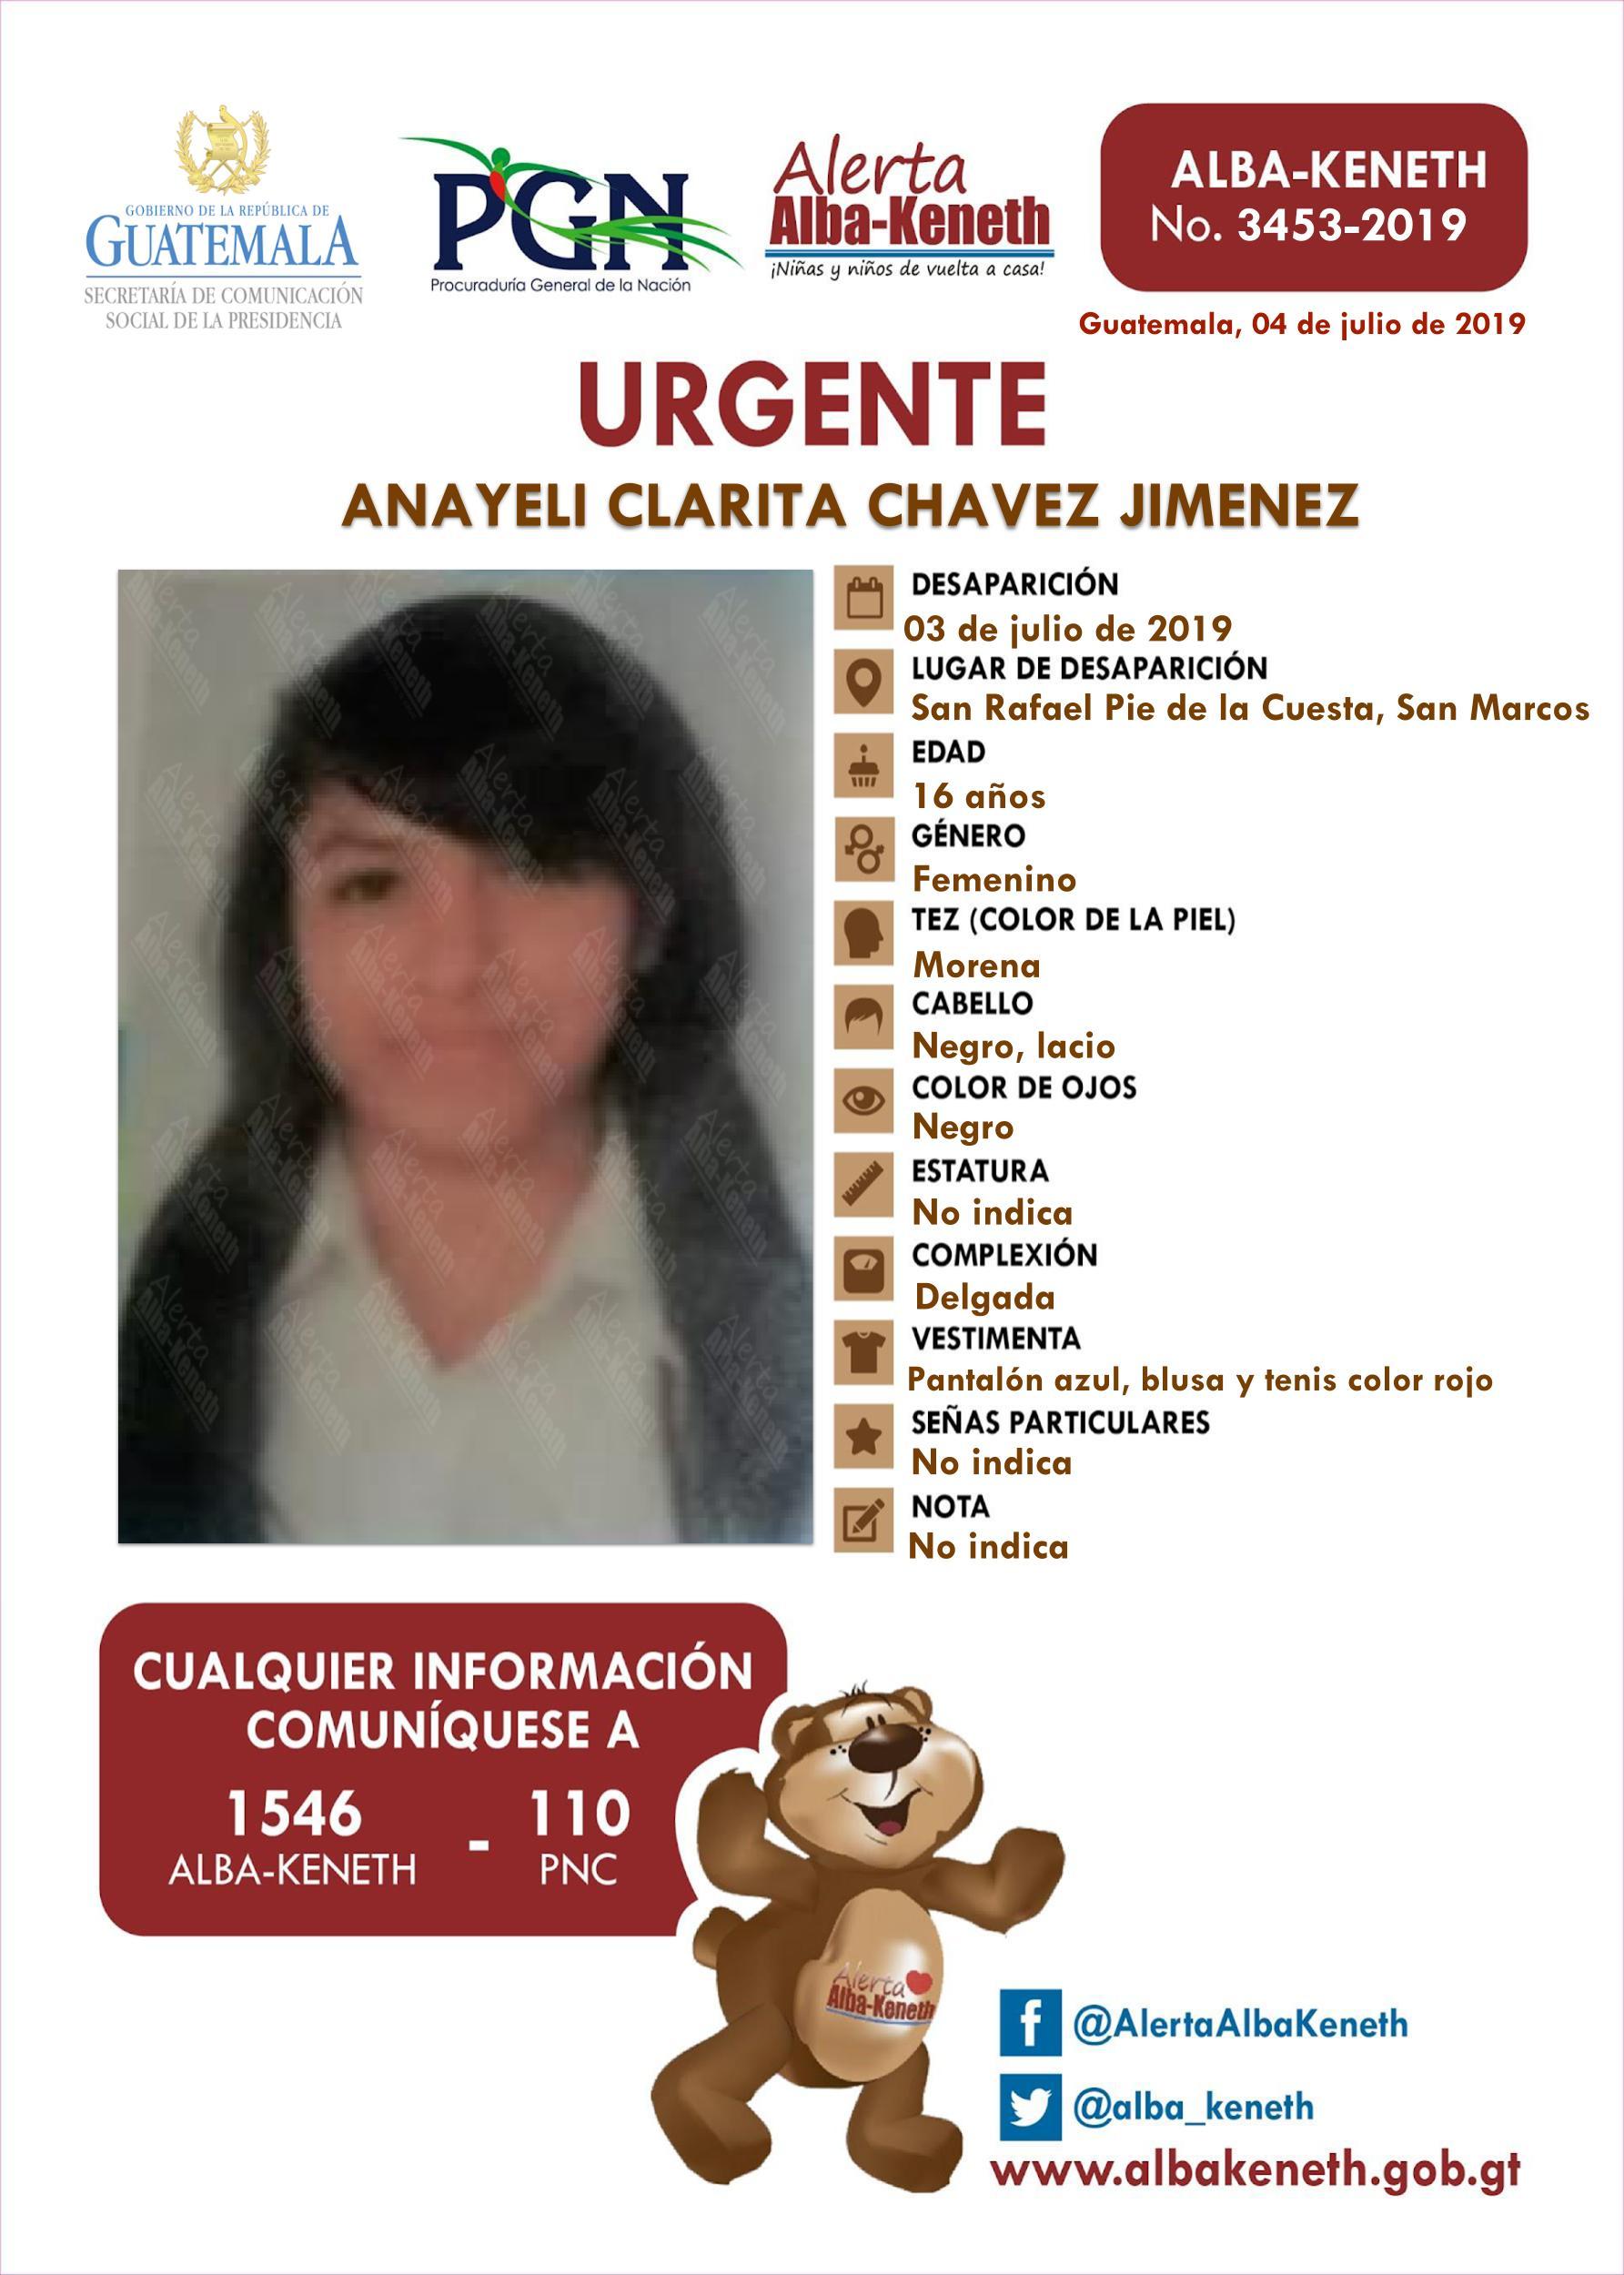 Anayeli Clarita Chavez Jimenez